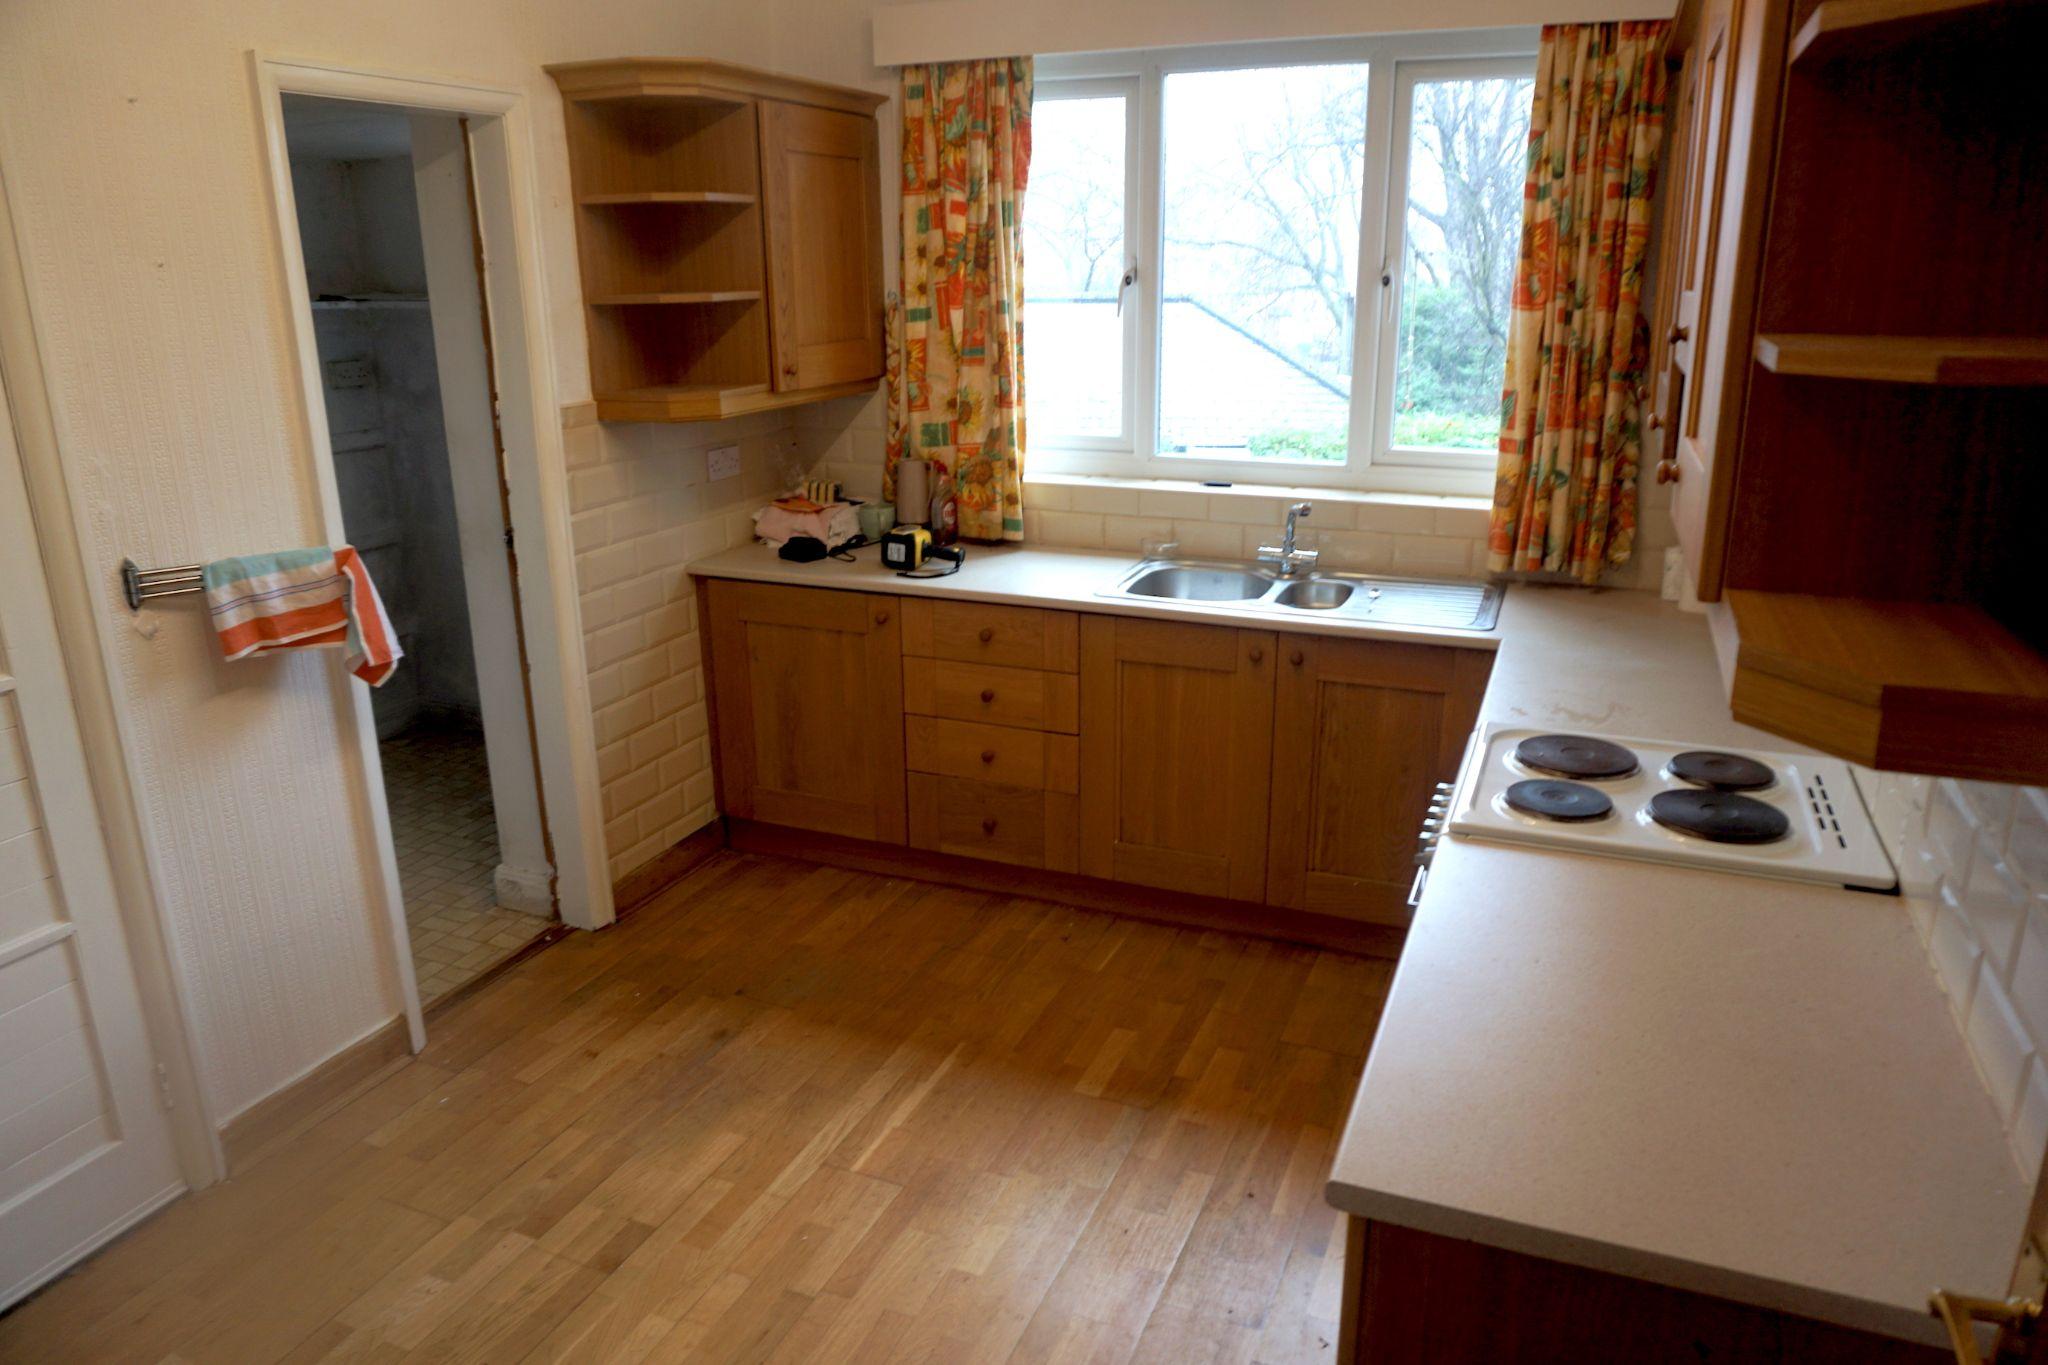 2 Bedroom Detached Bungalow For Sale - Kitchen